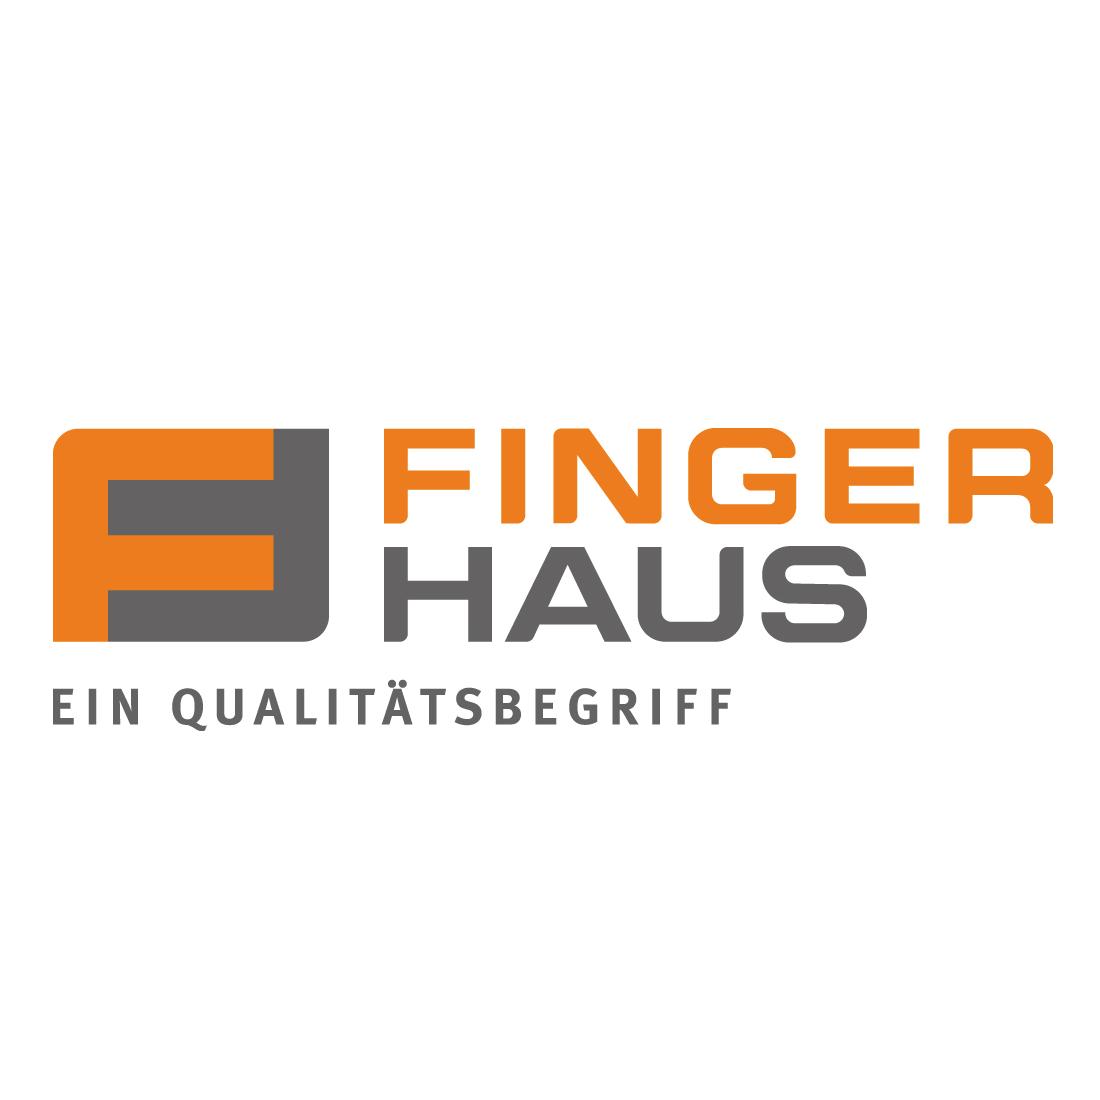 FingerHaus GmbH - Musterhaus Gießen